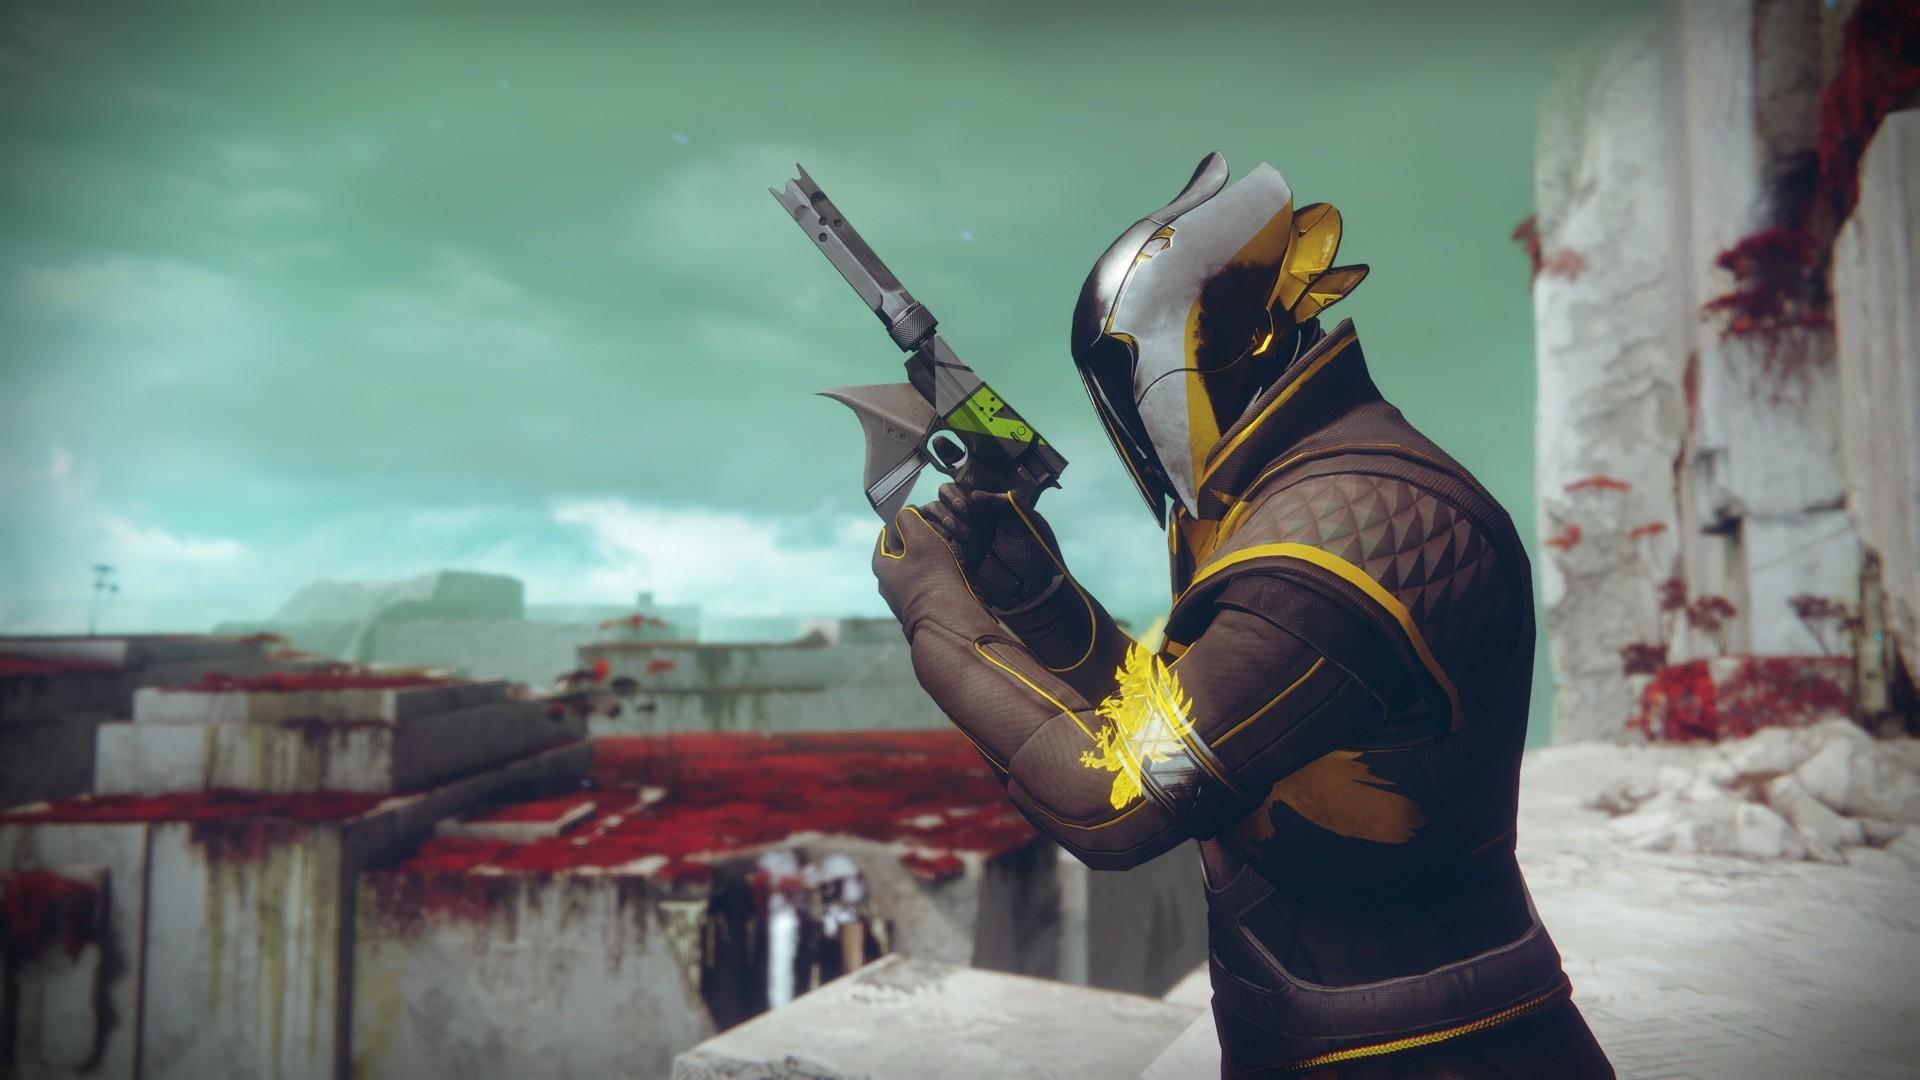 Awesome Destiny 2 Warlock Guardian wallpaper